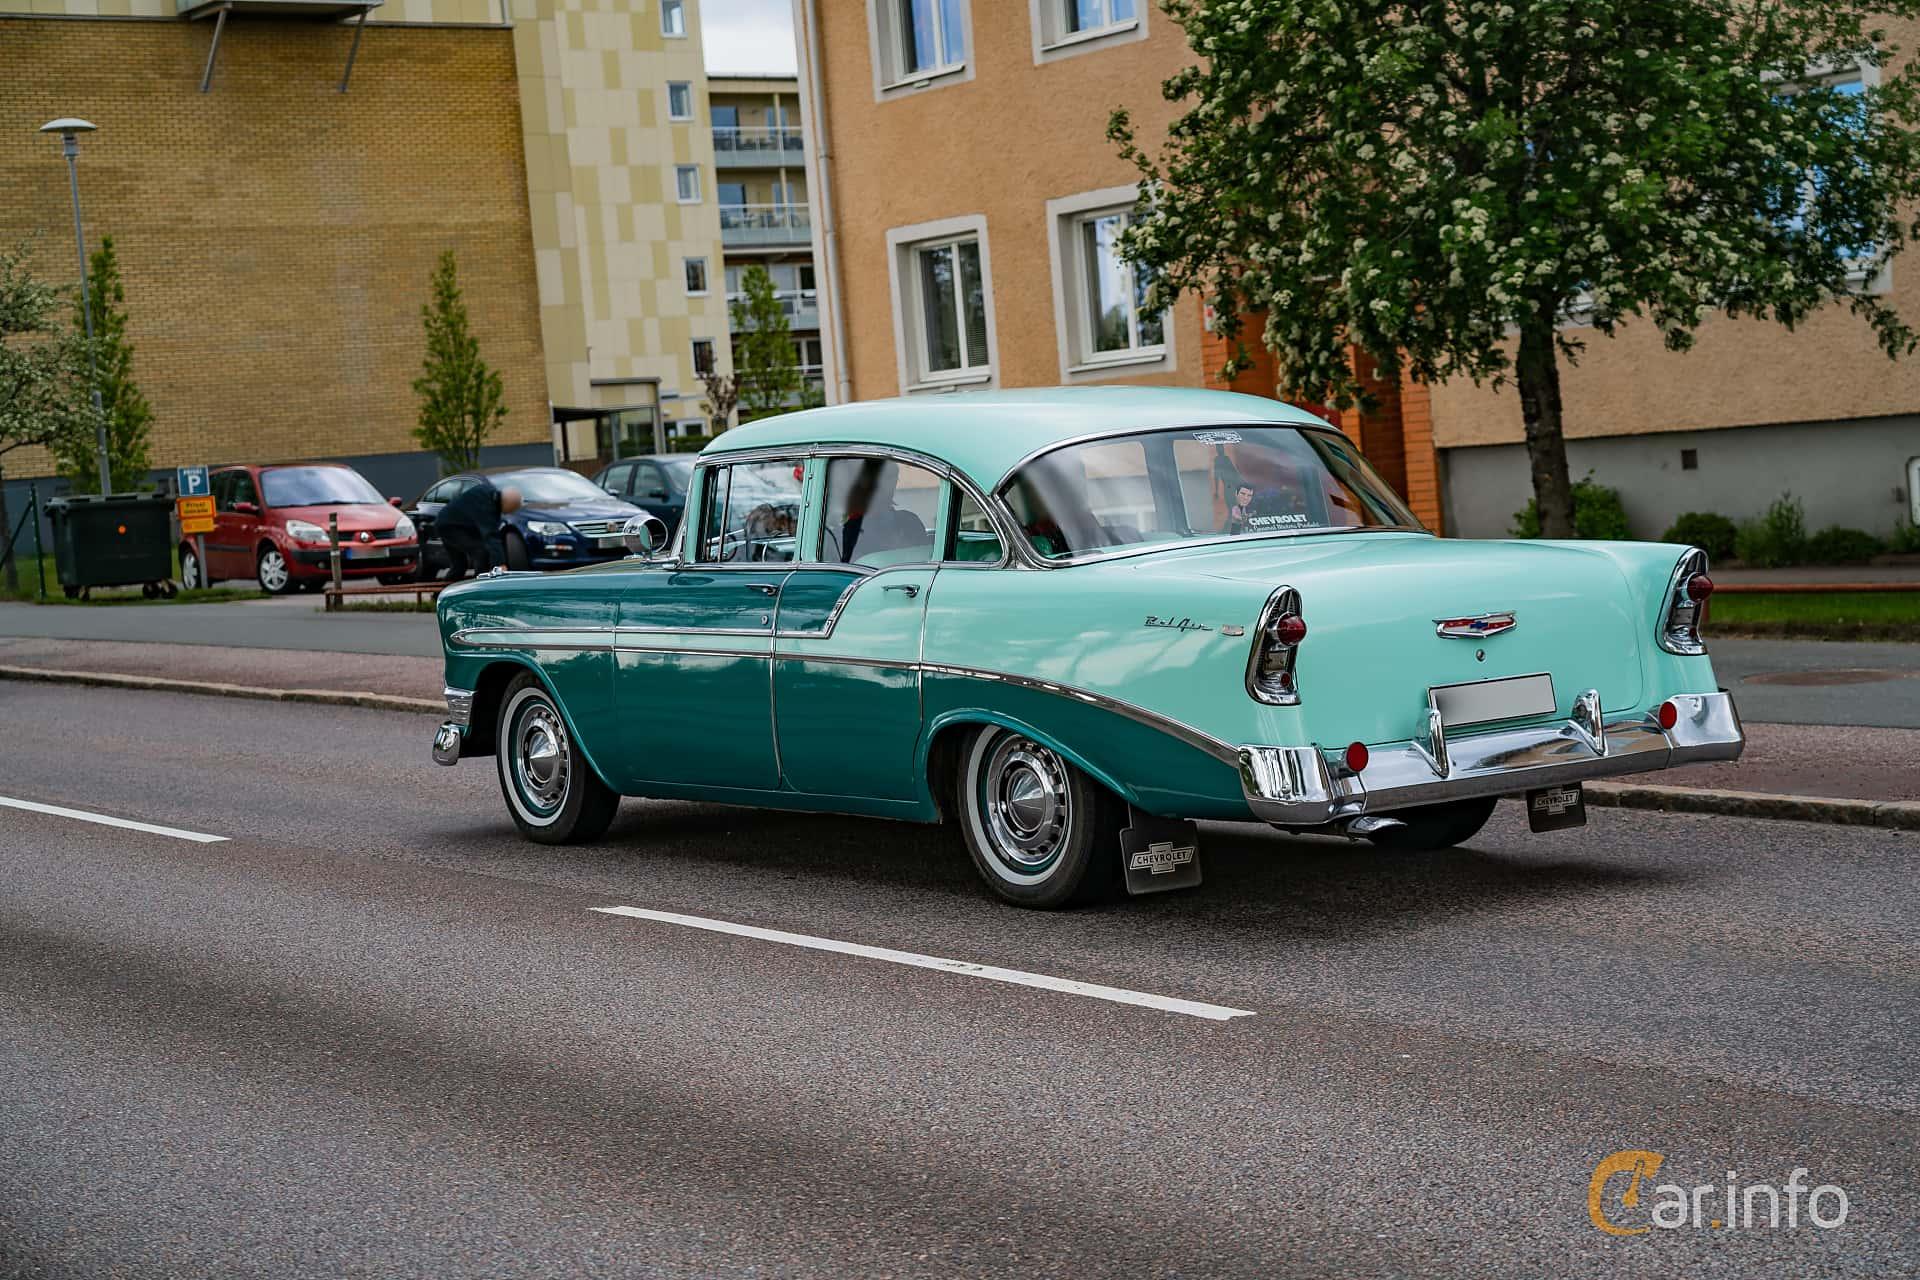 Chevrolet Bel Air 4-door Sedan 3.9 Powerglide, 142hp, 1956 at Riksettanrallyt 2019 Skillingaryd